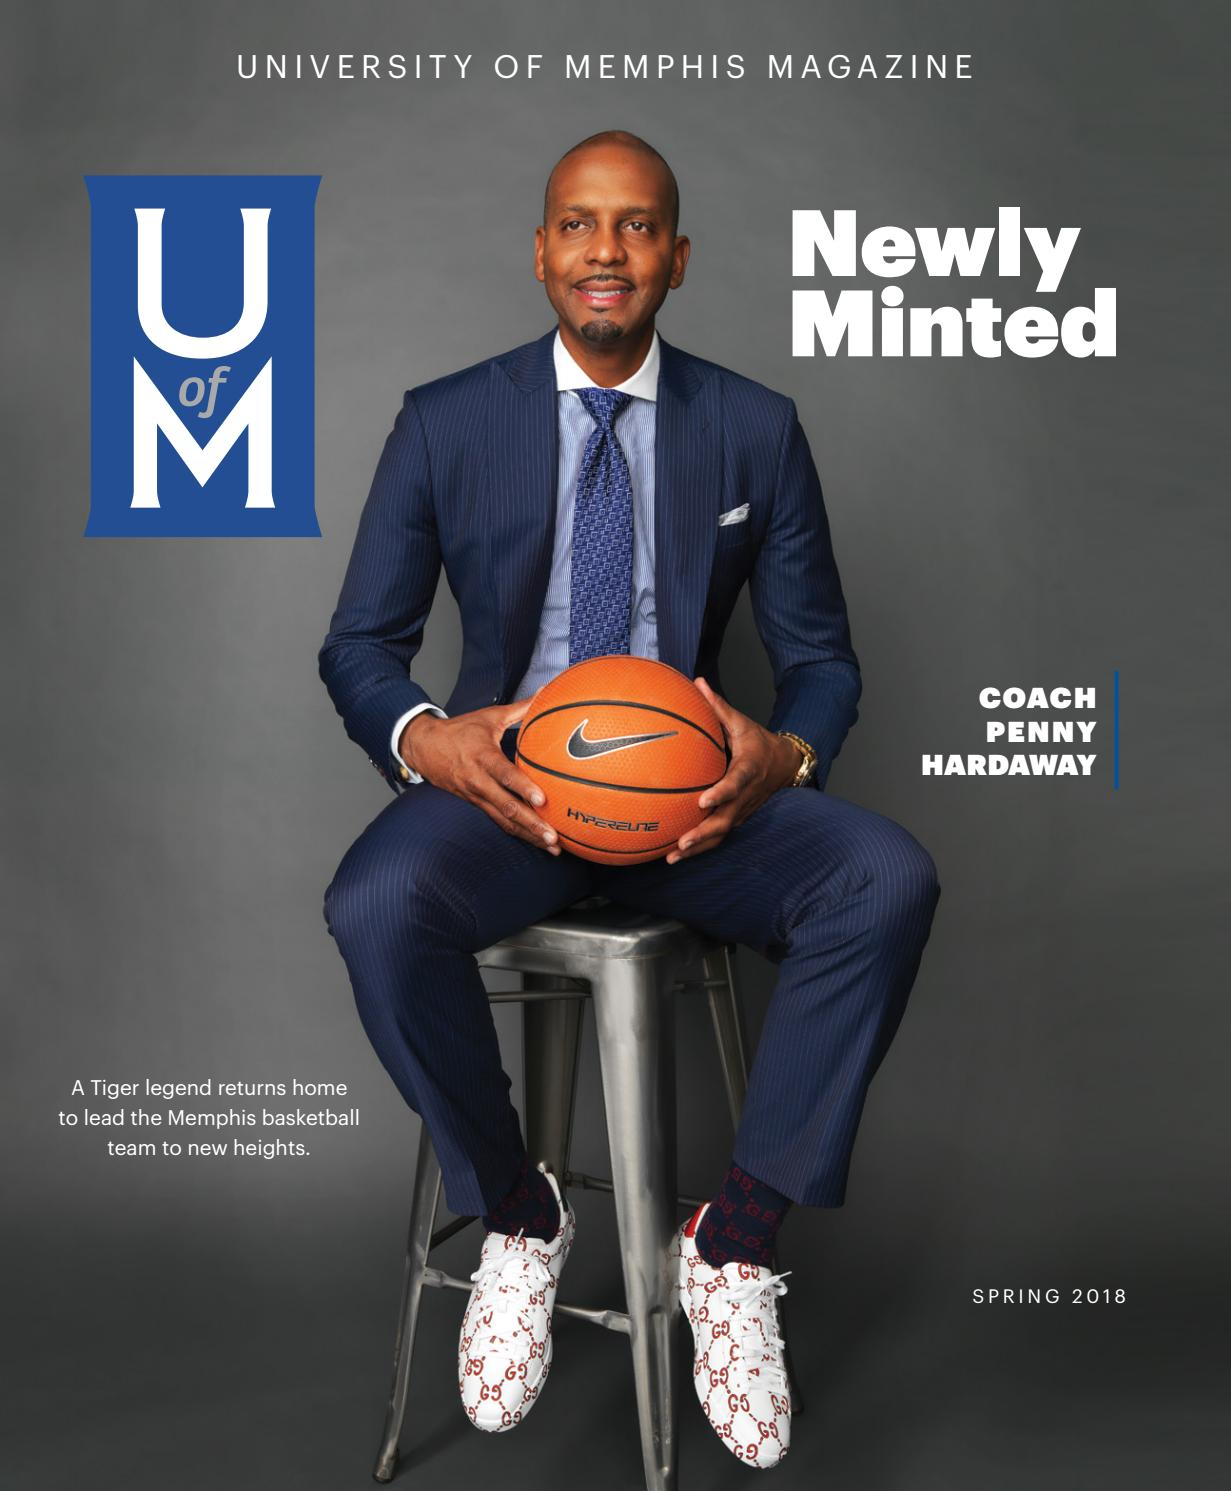 brand new b66b4 8c48d UofM Magazine Spring 2018 by University of Memphis - issuu